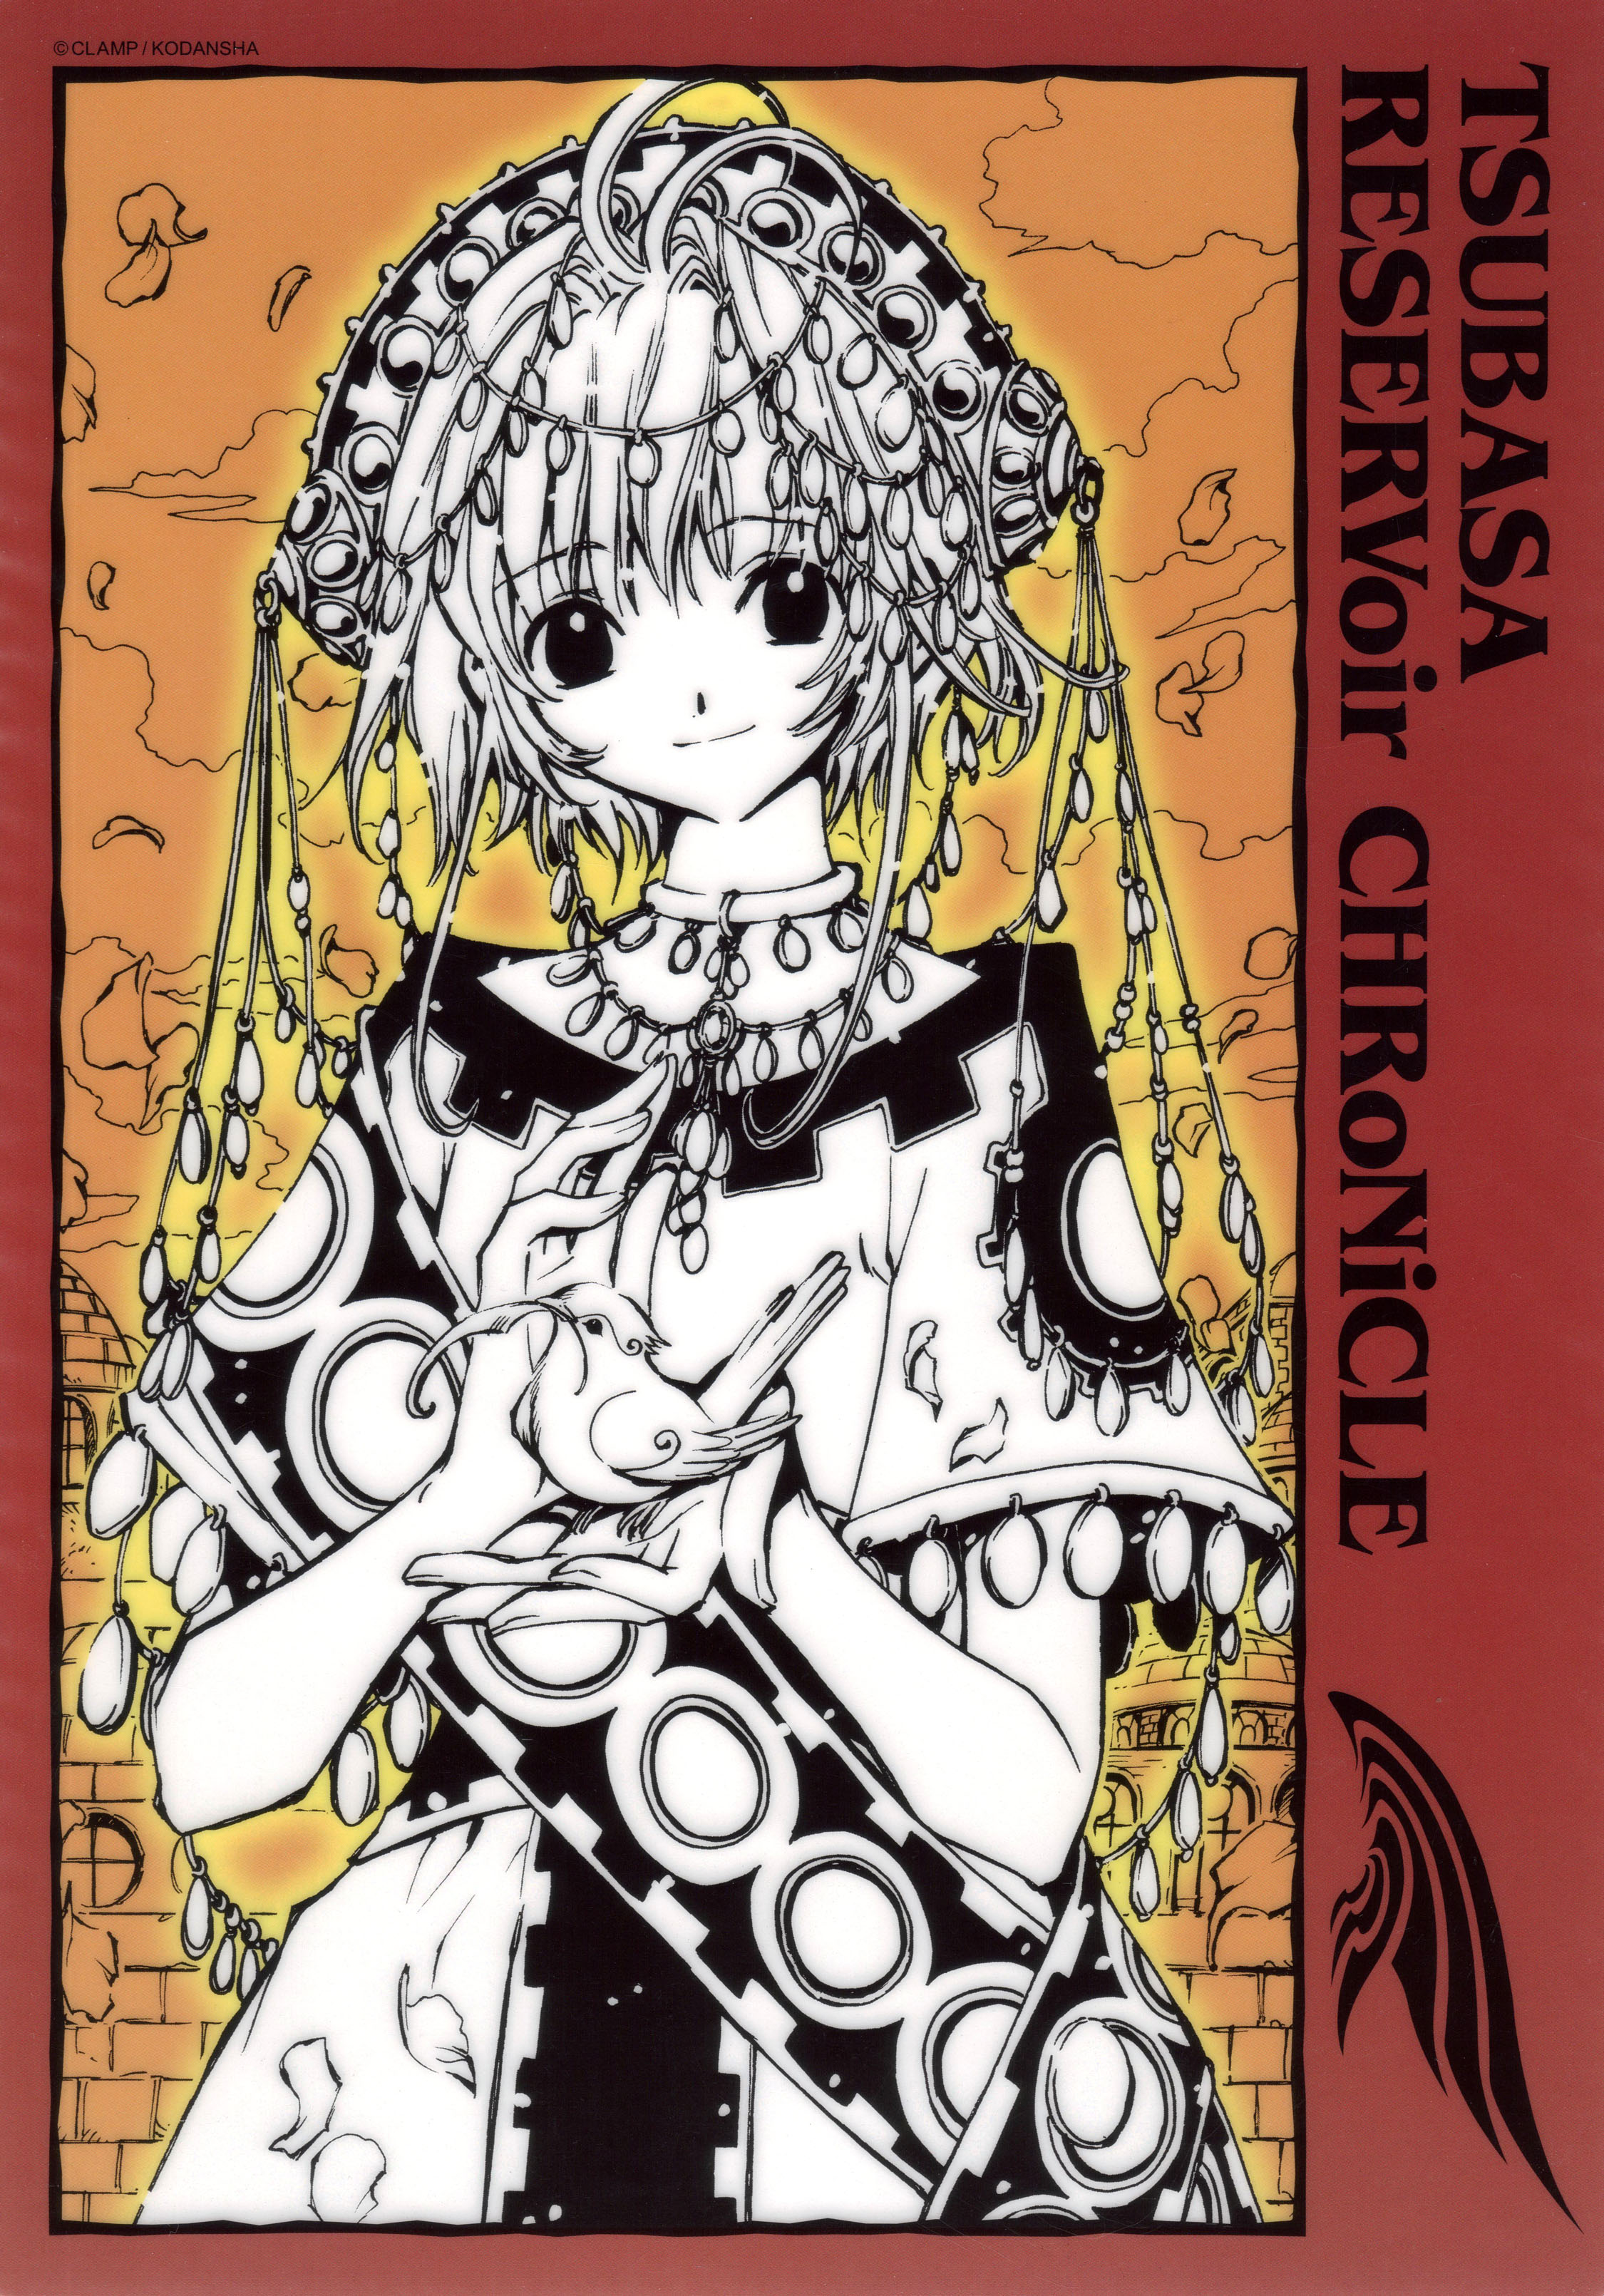 Tsubasa: Reservoir Chronicle, Vol. 4, Clamp, 034547791X, Book, Good